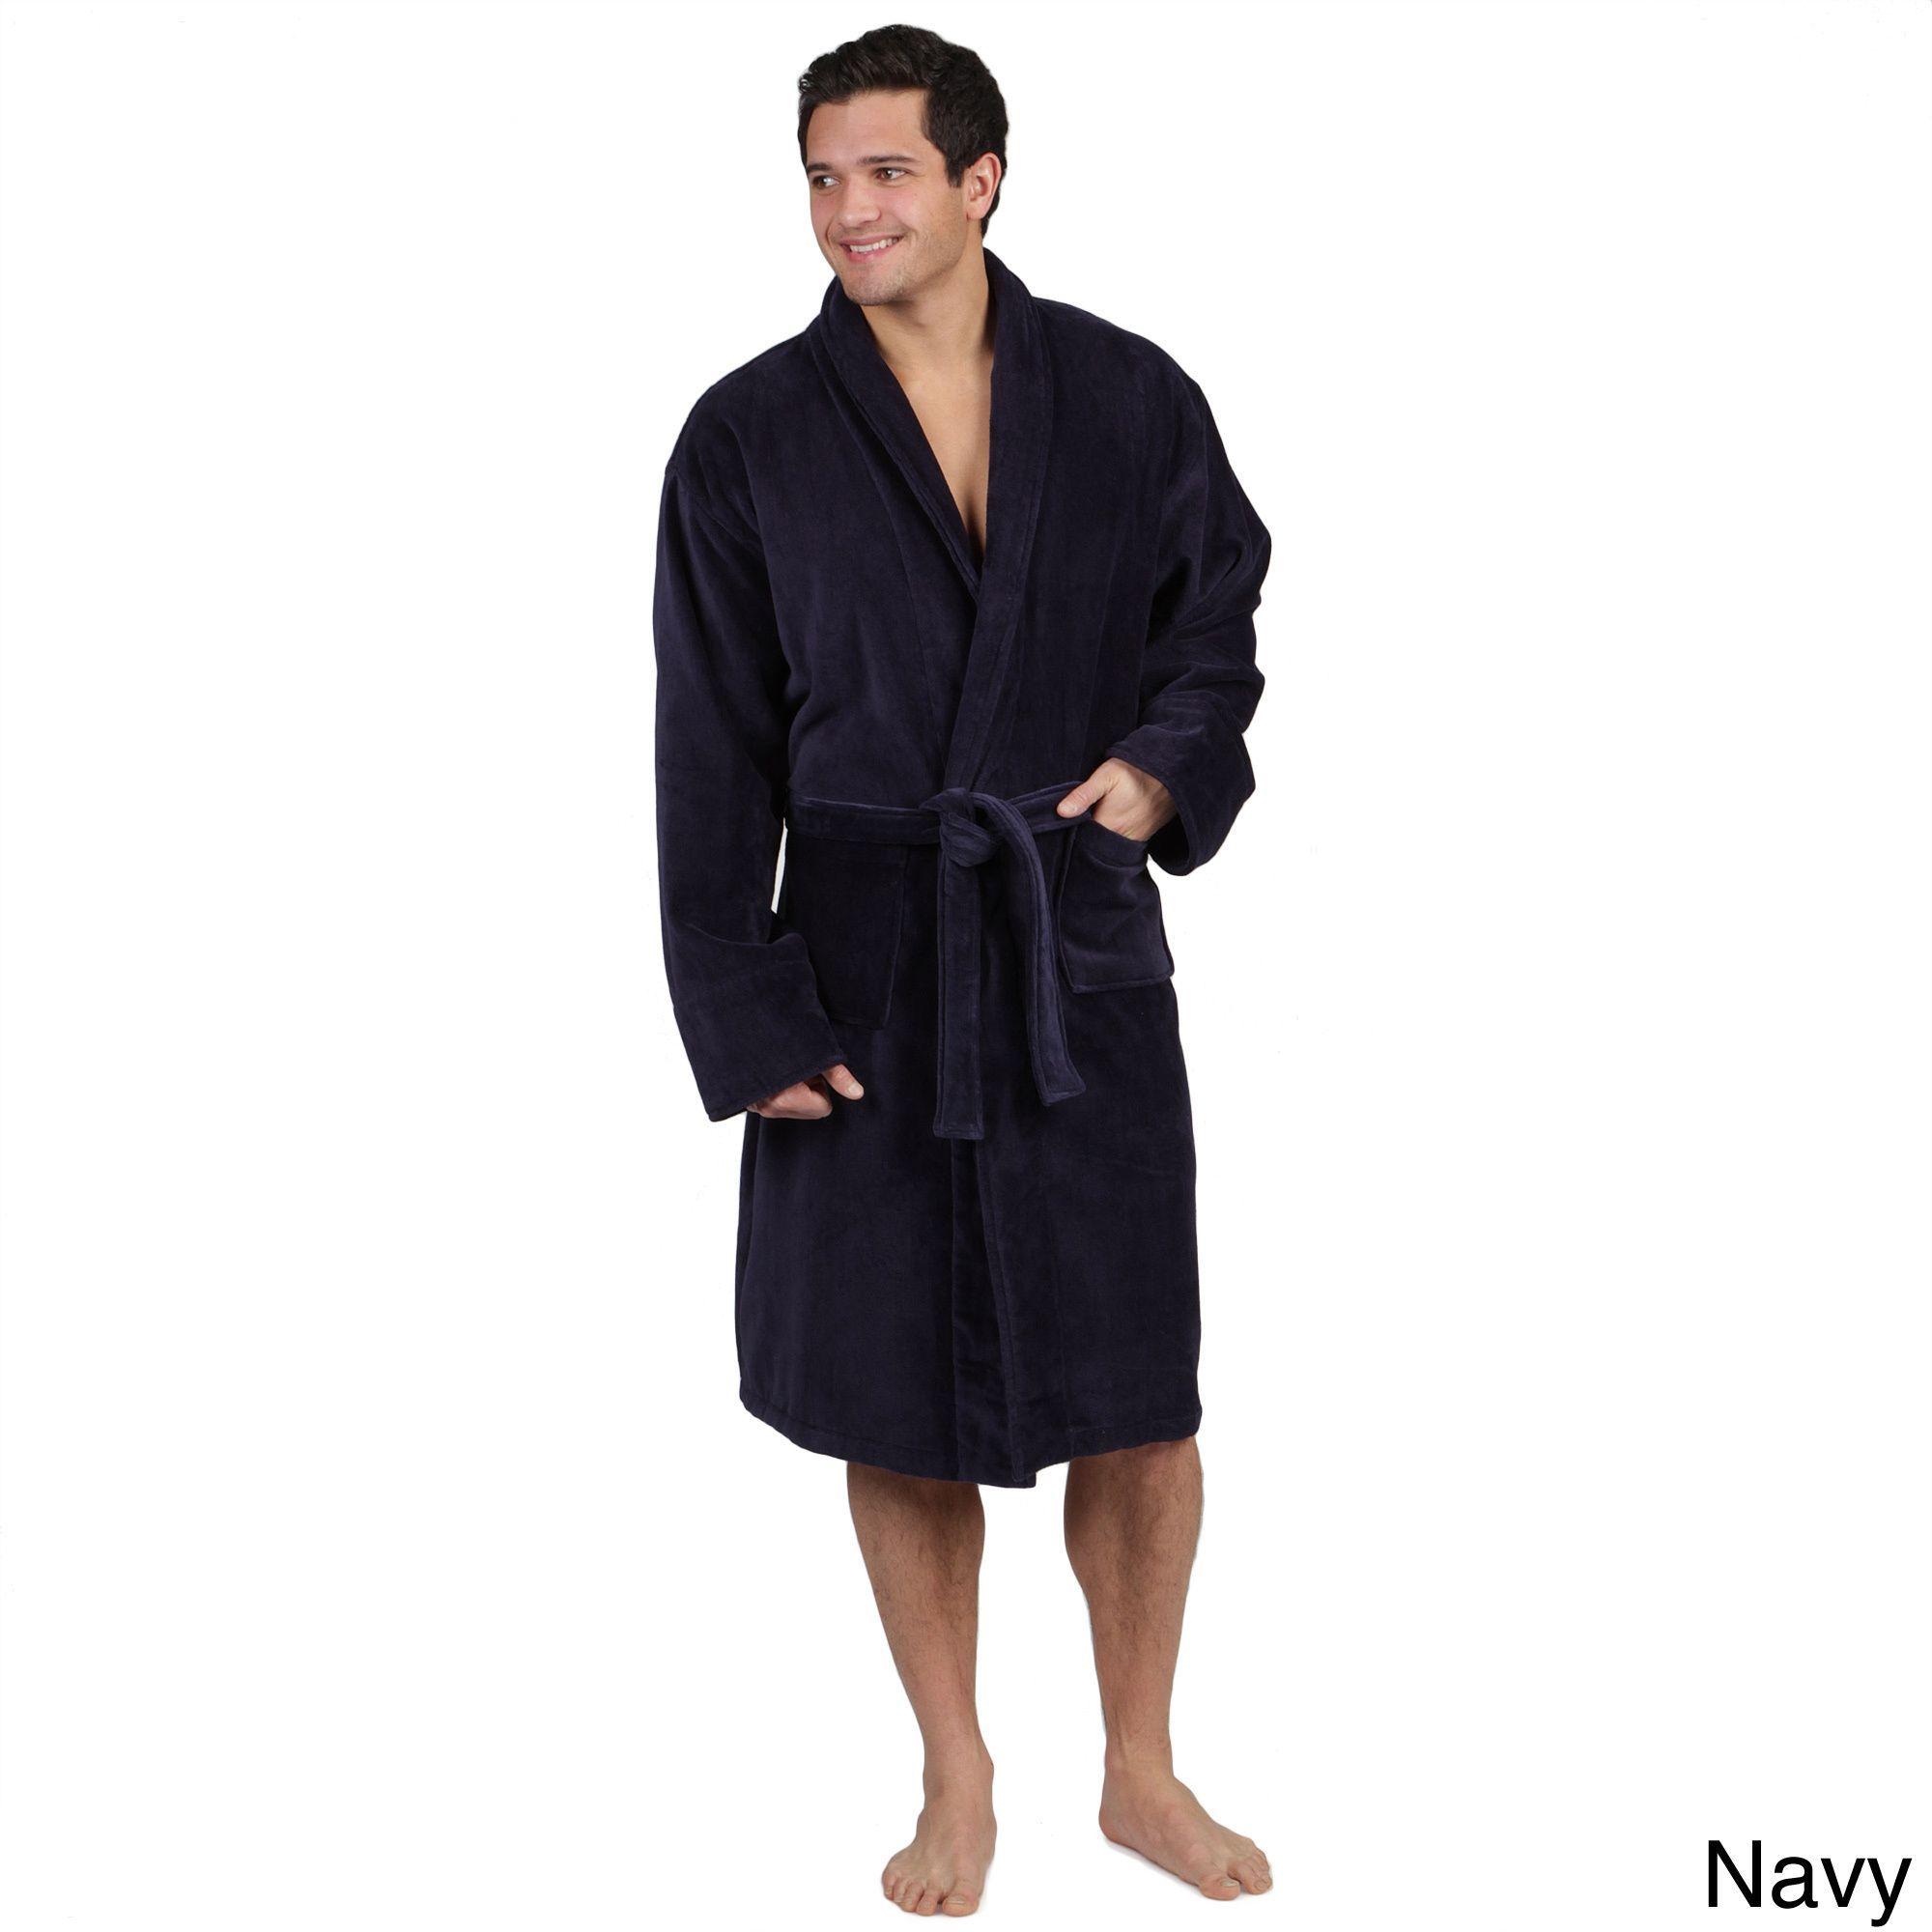 LCM Home Fashions Men s Terrycloth Bath Robe. This velvety-soft ... d20923ef7